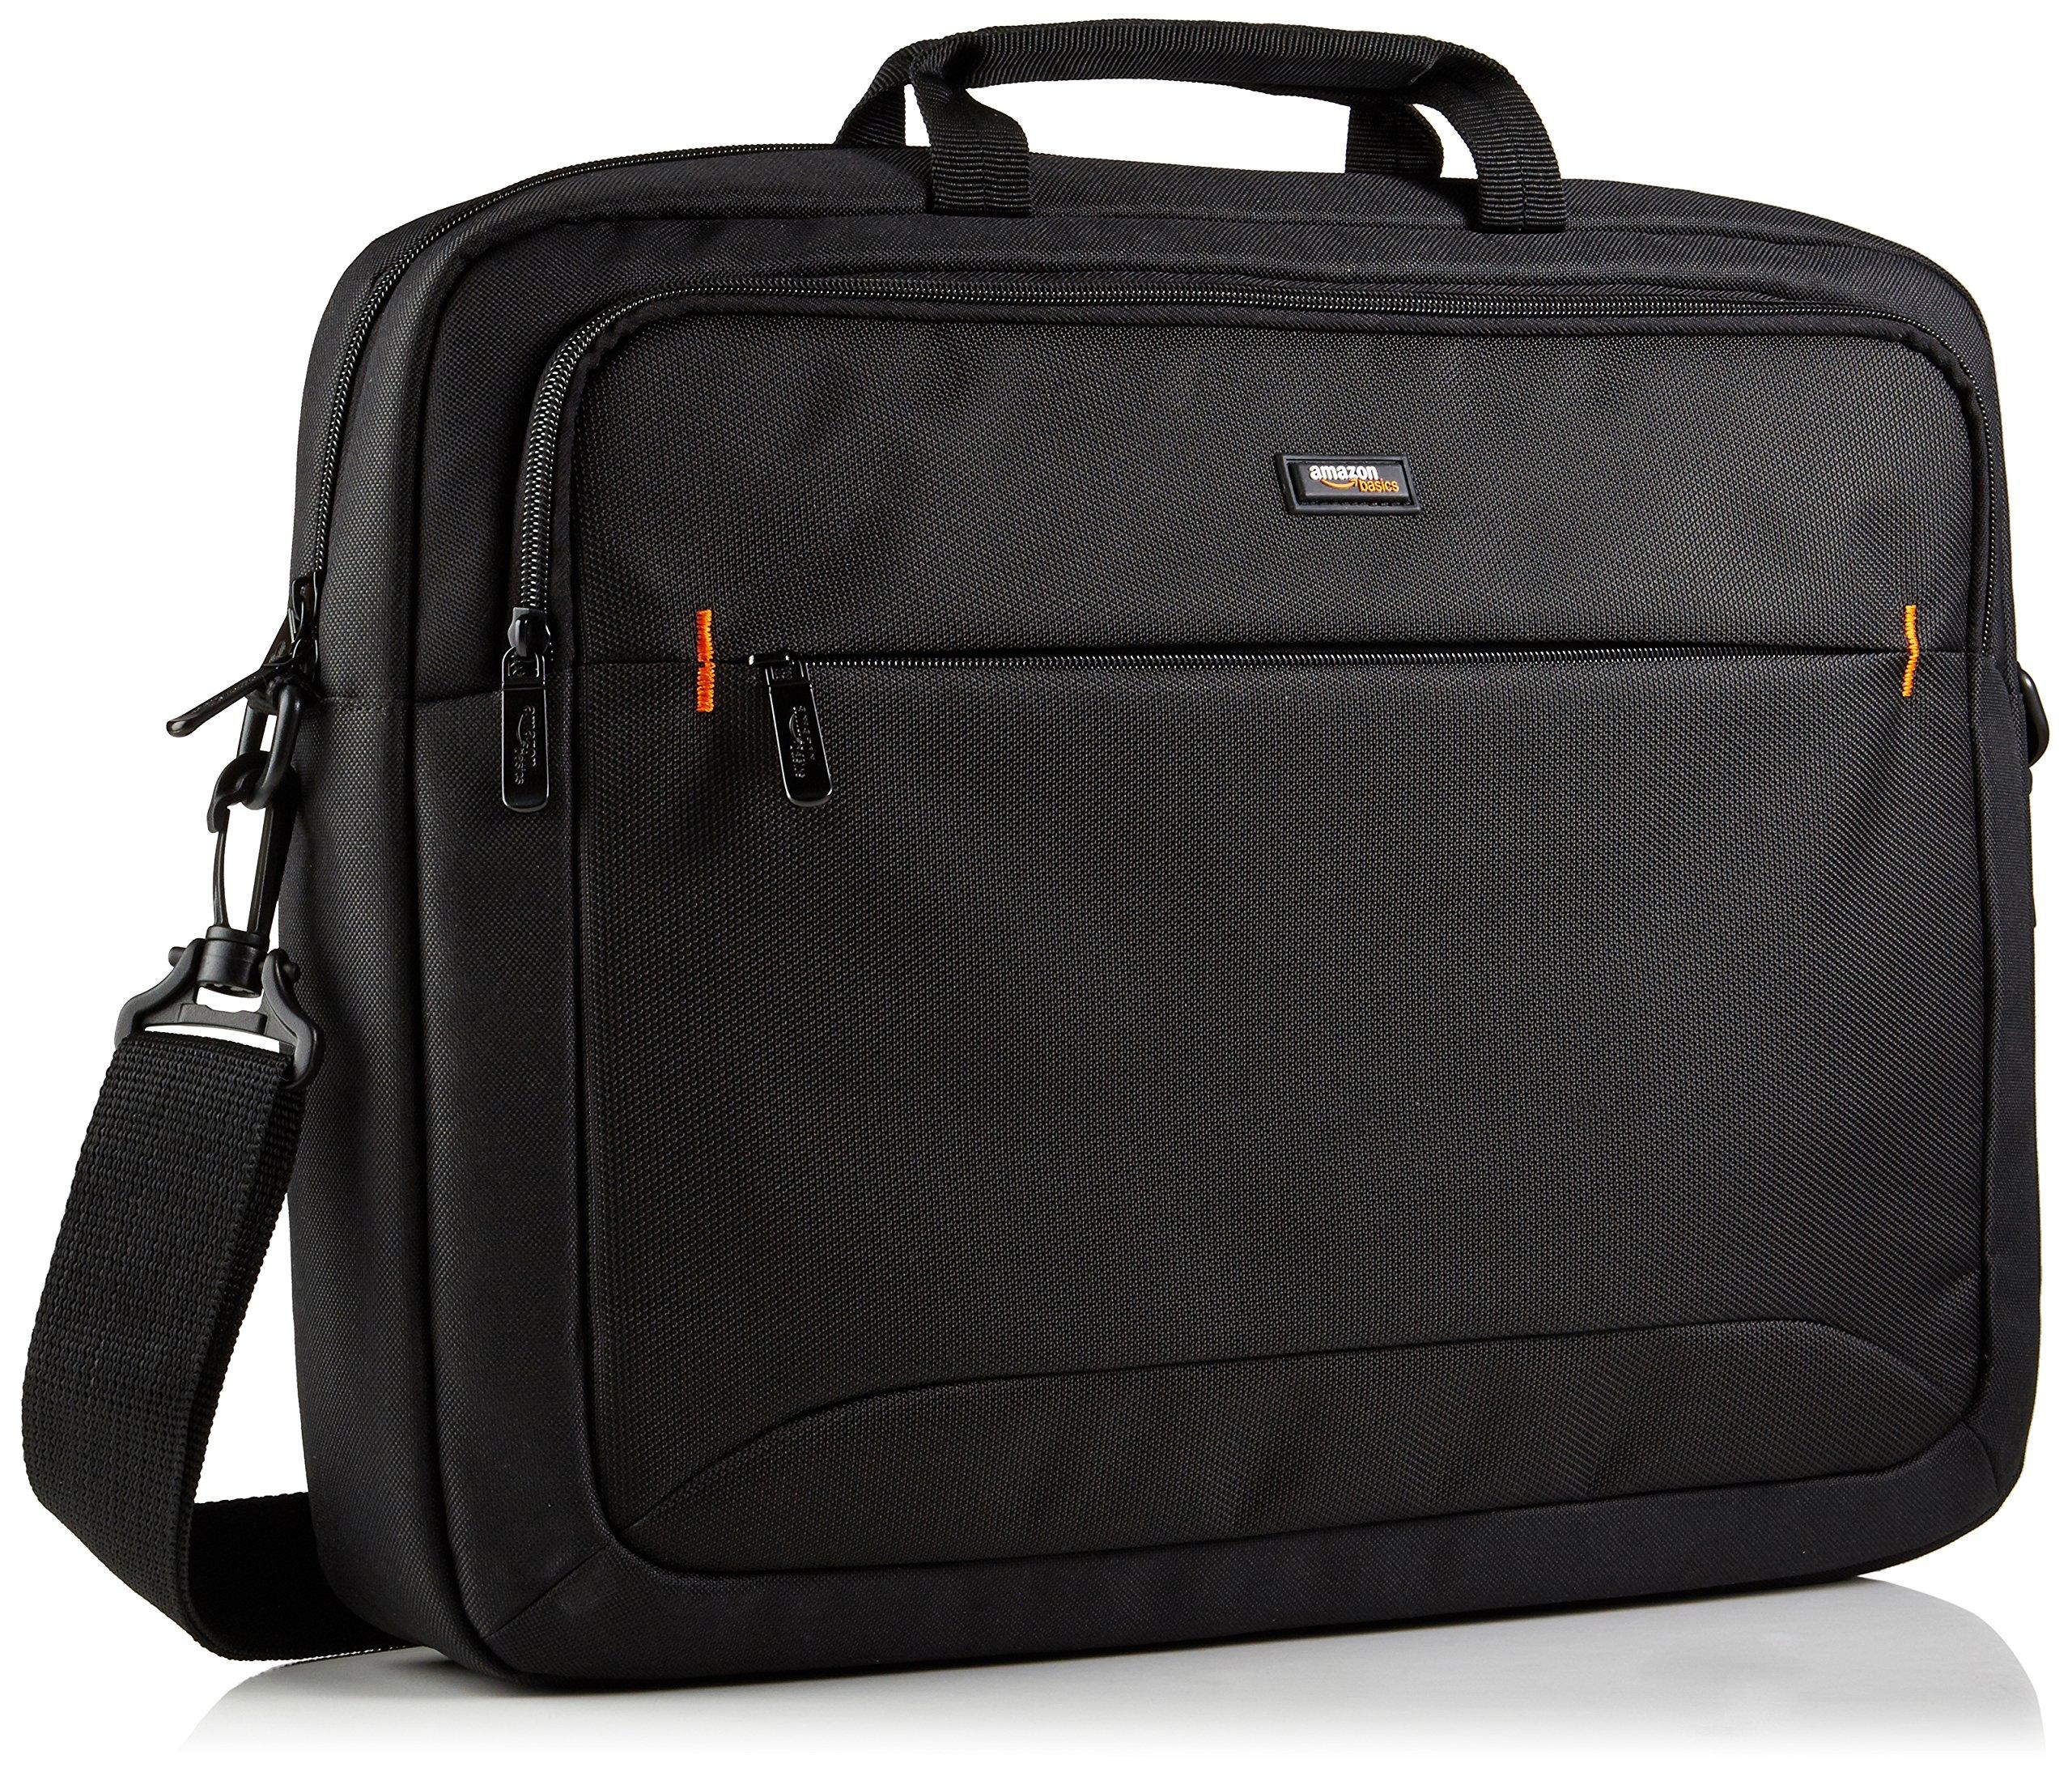 AmazonBasics 17.3-Inch HP Laptop Case Bag by AmazonBasics